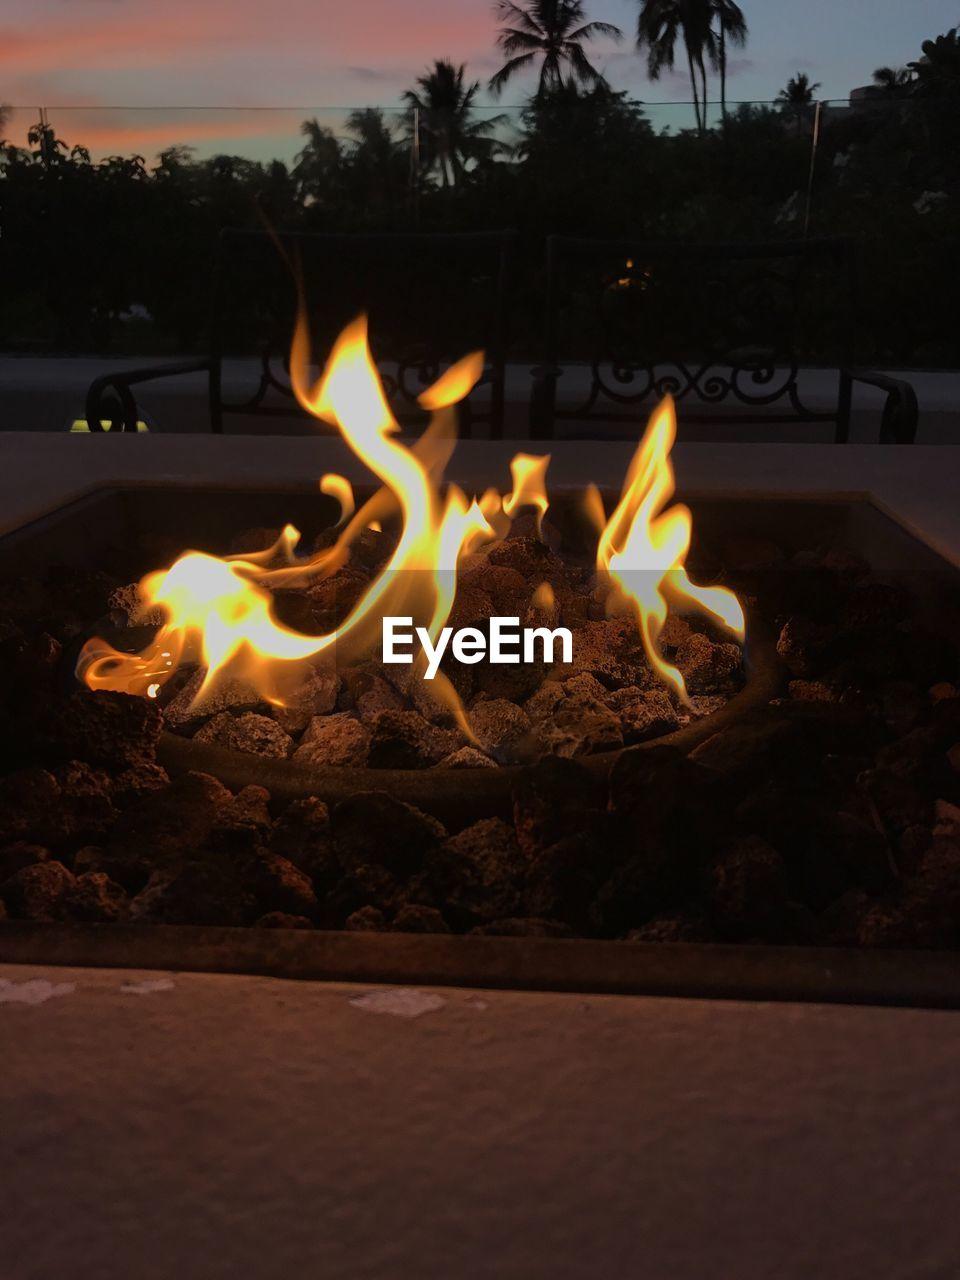 burning, flame, heat - temperature, glowing, sunset, night, outdoors, no people, tree, illuminated, nature, close-up, diya - oil lamp, sky